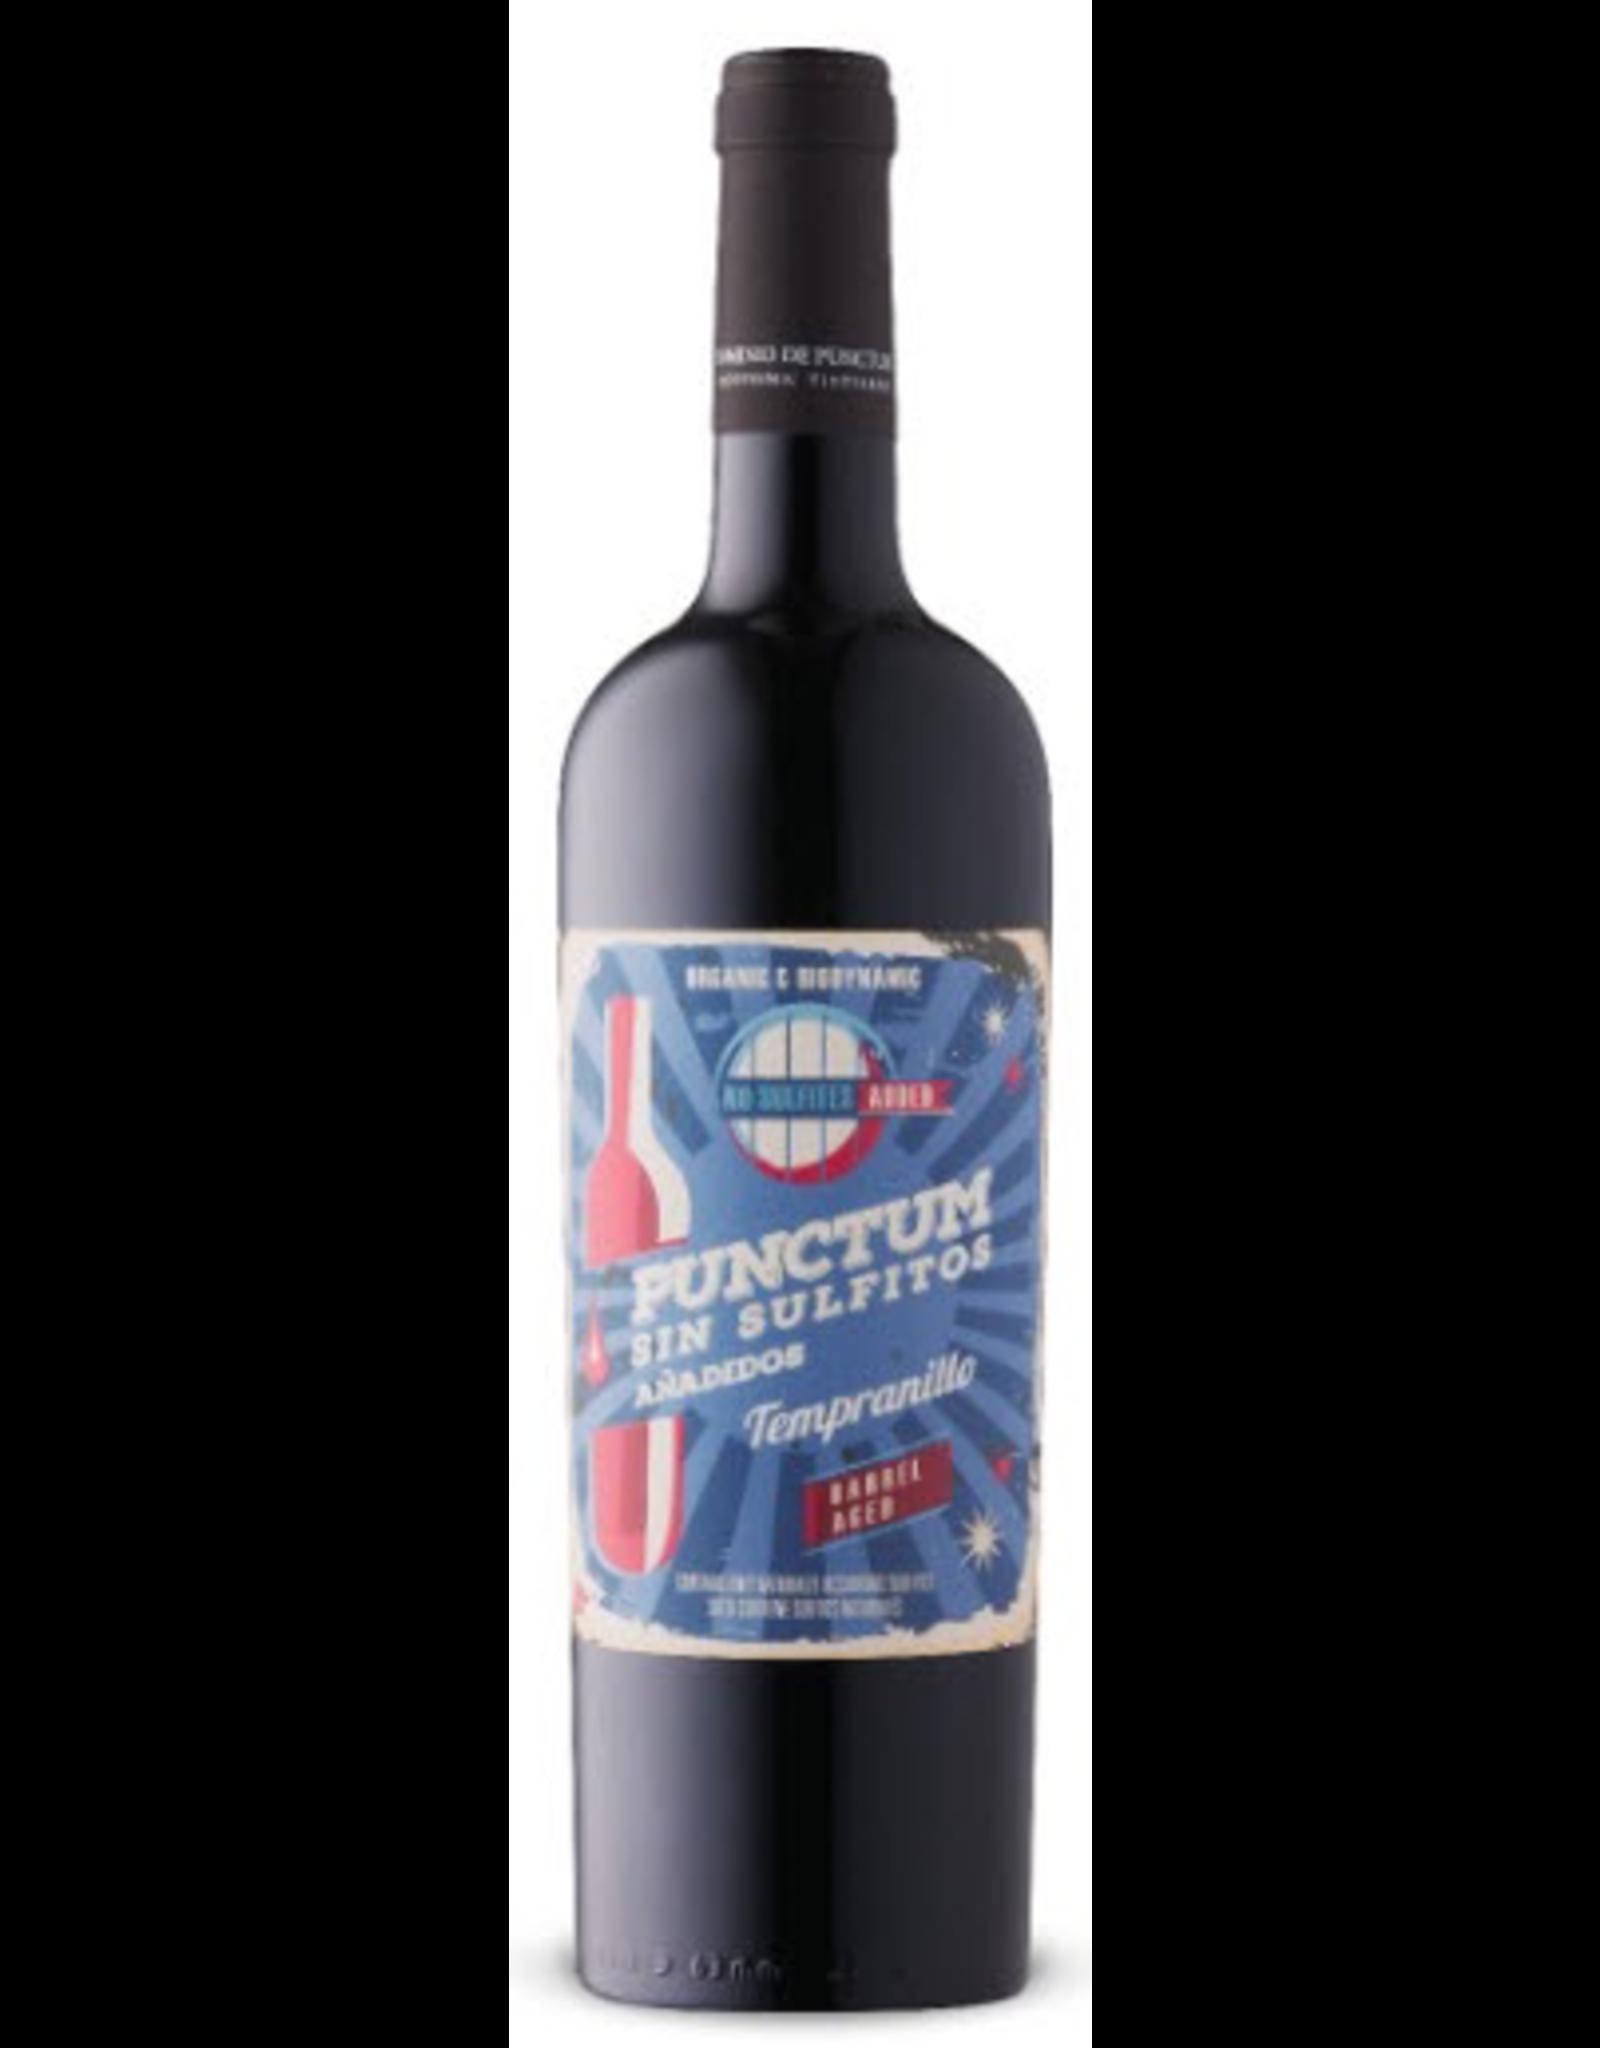 Red Wine 2018, Punctum Low Sulfite Organic & Biodynamic, Tempranillo, Las Pedroñeras, La Mancha, Spain, 13.5% Alc, CTnr